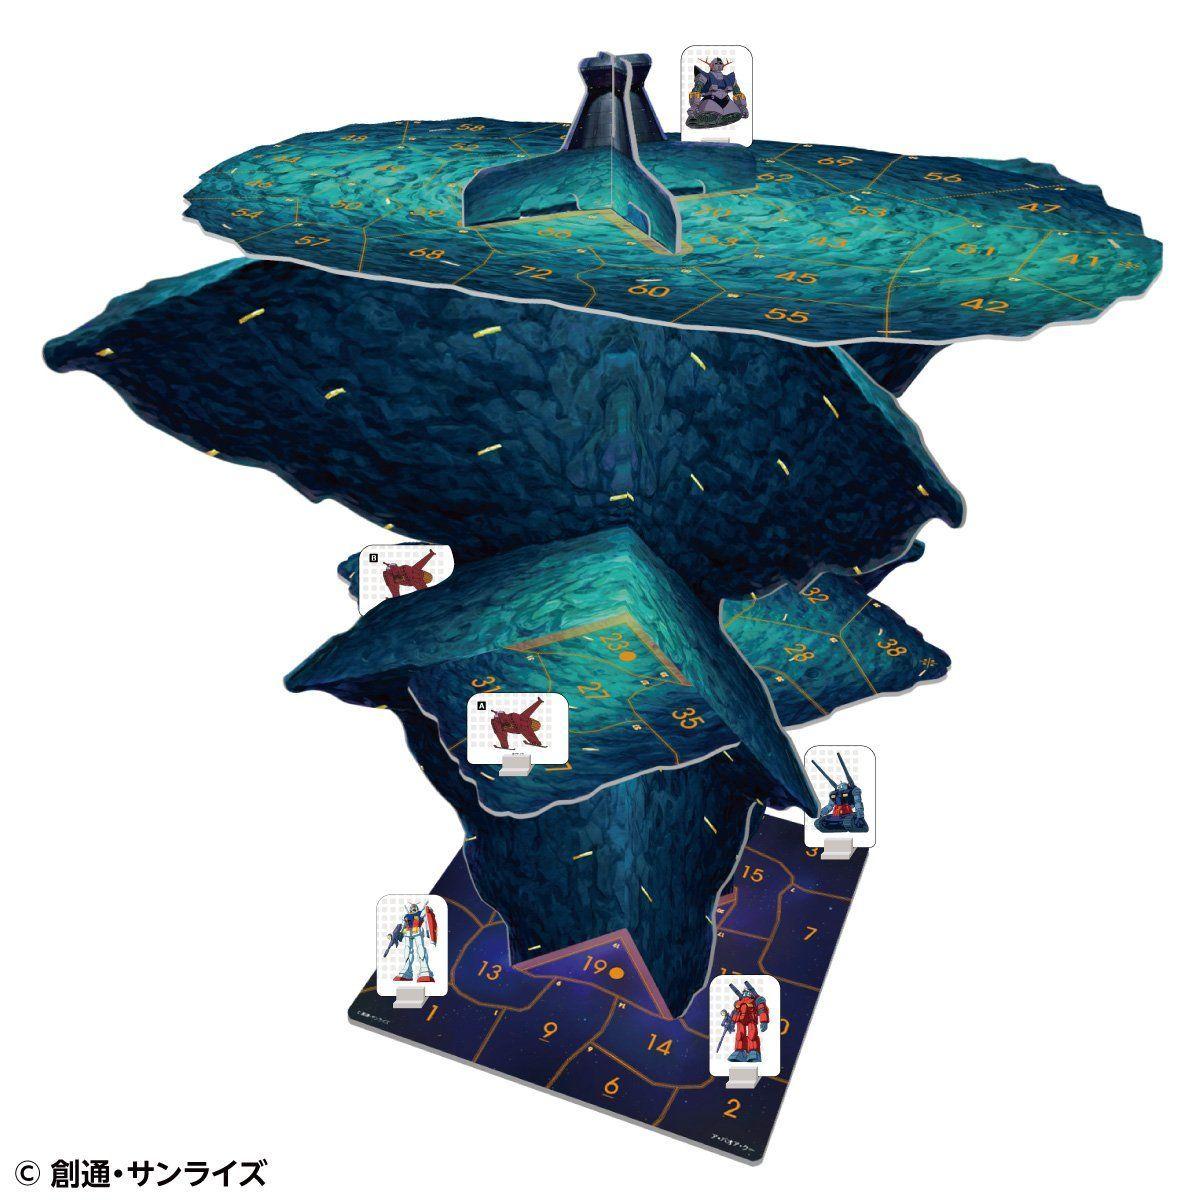 GUNDAM THE GAME『機動戦士ガンダム:めぐりあい宇宙』ボードゲーム-005